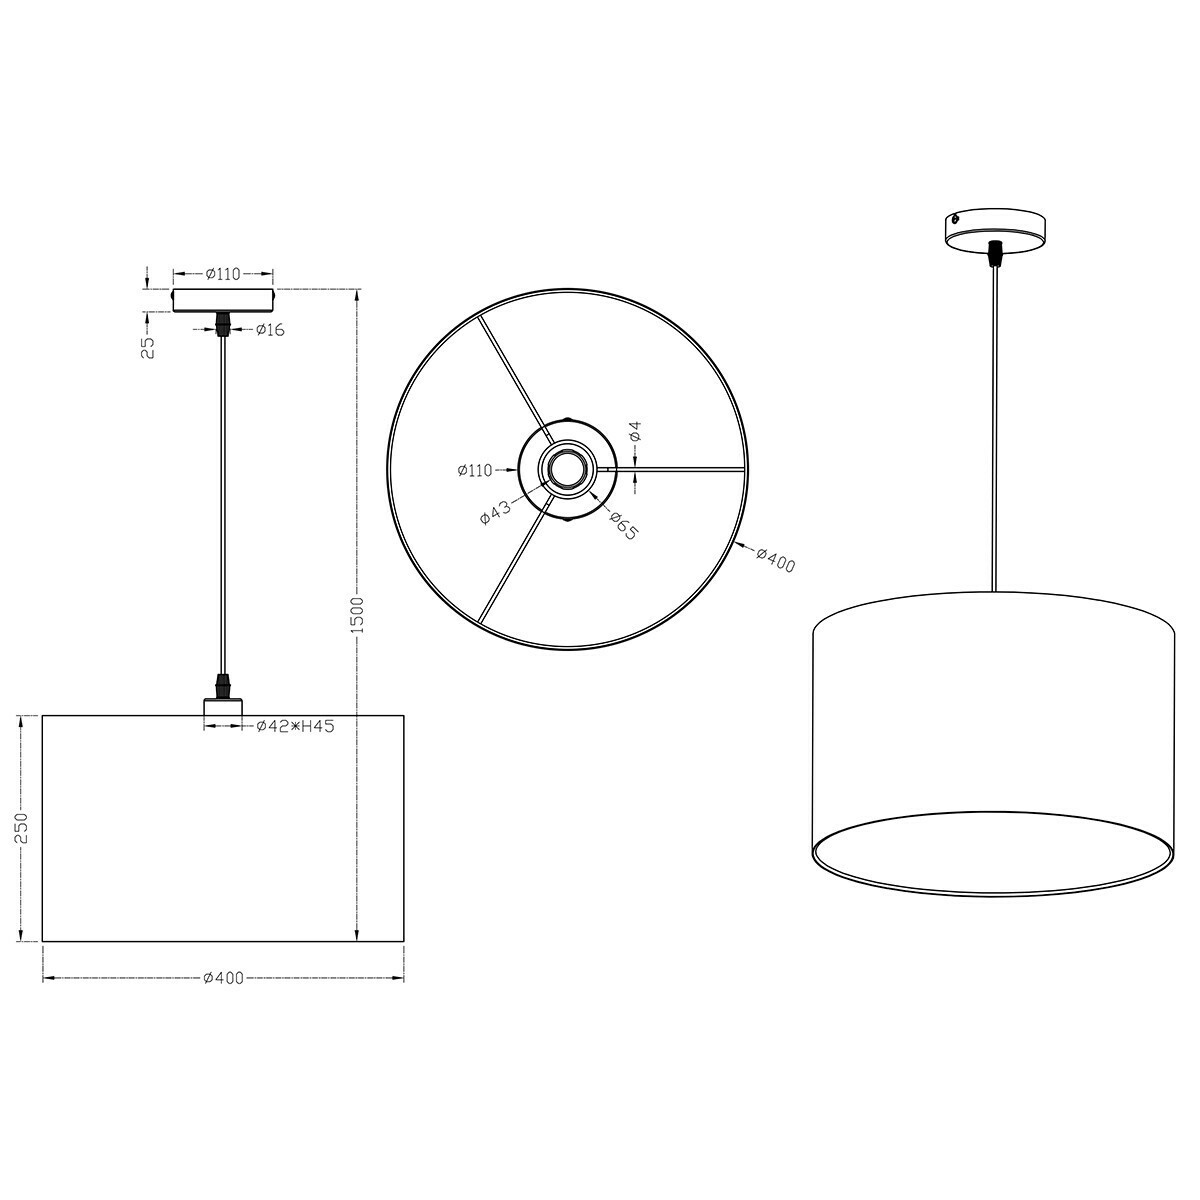 LED Hanglamp Hangverlichting Trion Hotia E27 Fitting Rond Mat Bruin Aluminium